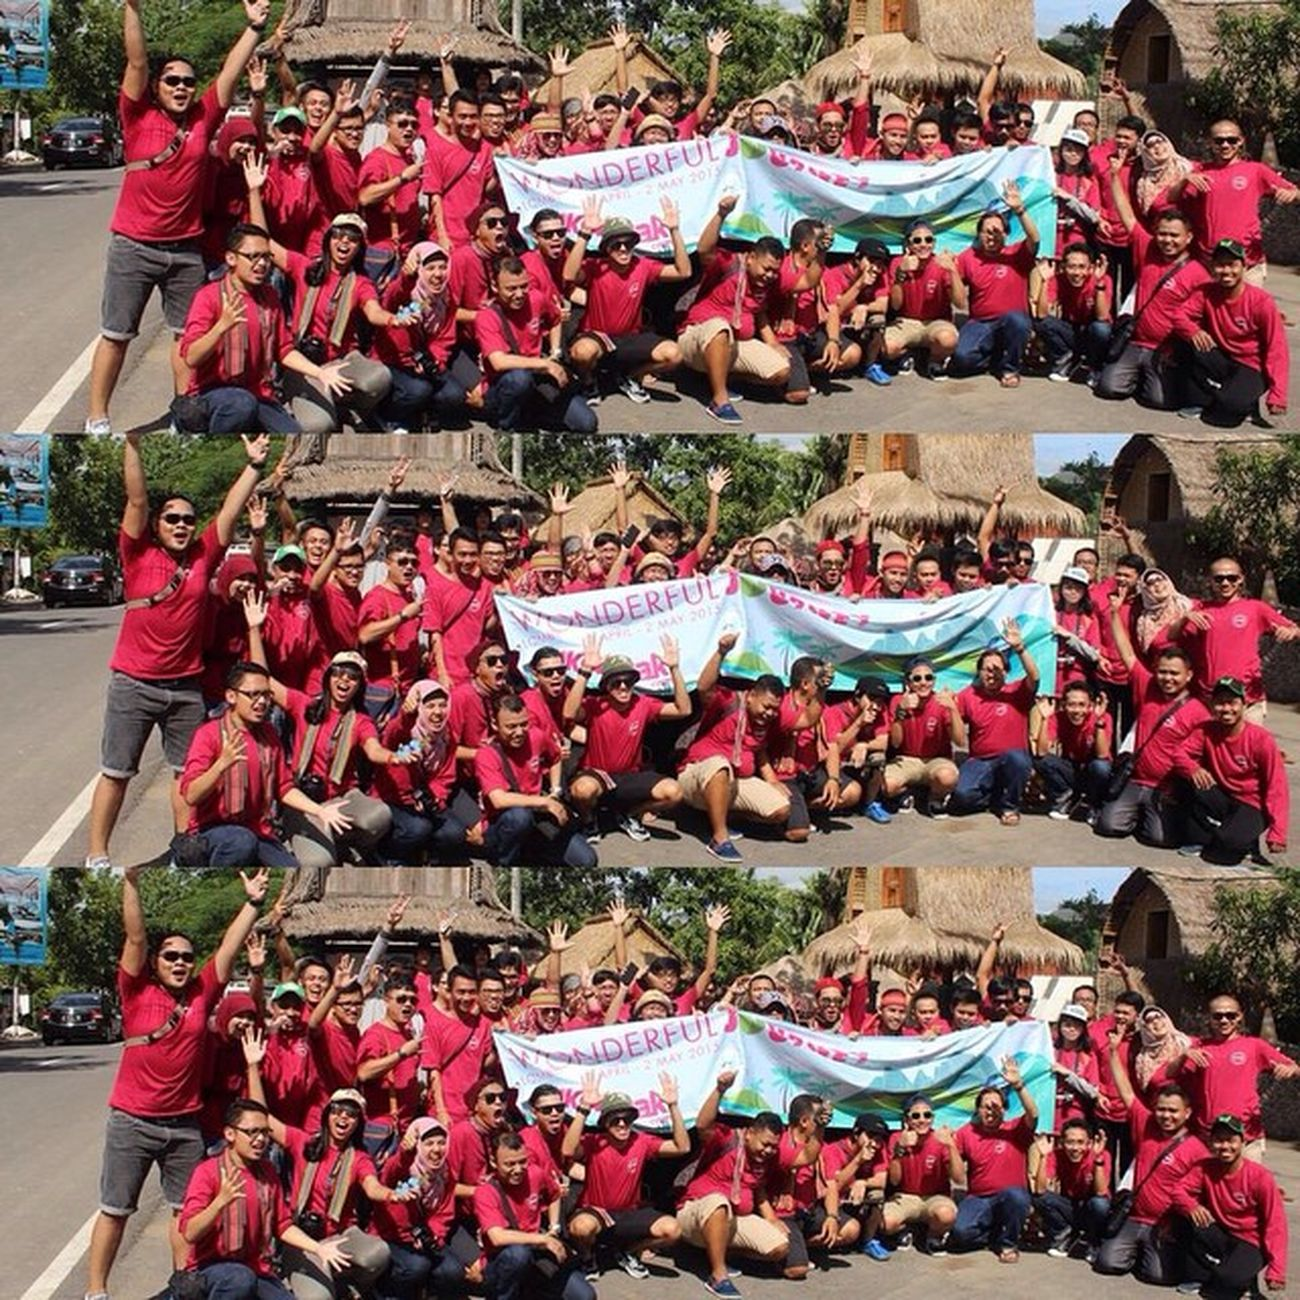 Beautiful Moment📝 Latepost Sasaksade Desasasaklombok Lombok beautifulplace indonesiaindah ExploreIndonesia jelajahindonesia outing bukalapak wonderfuljourney